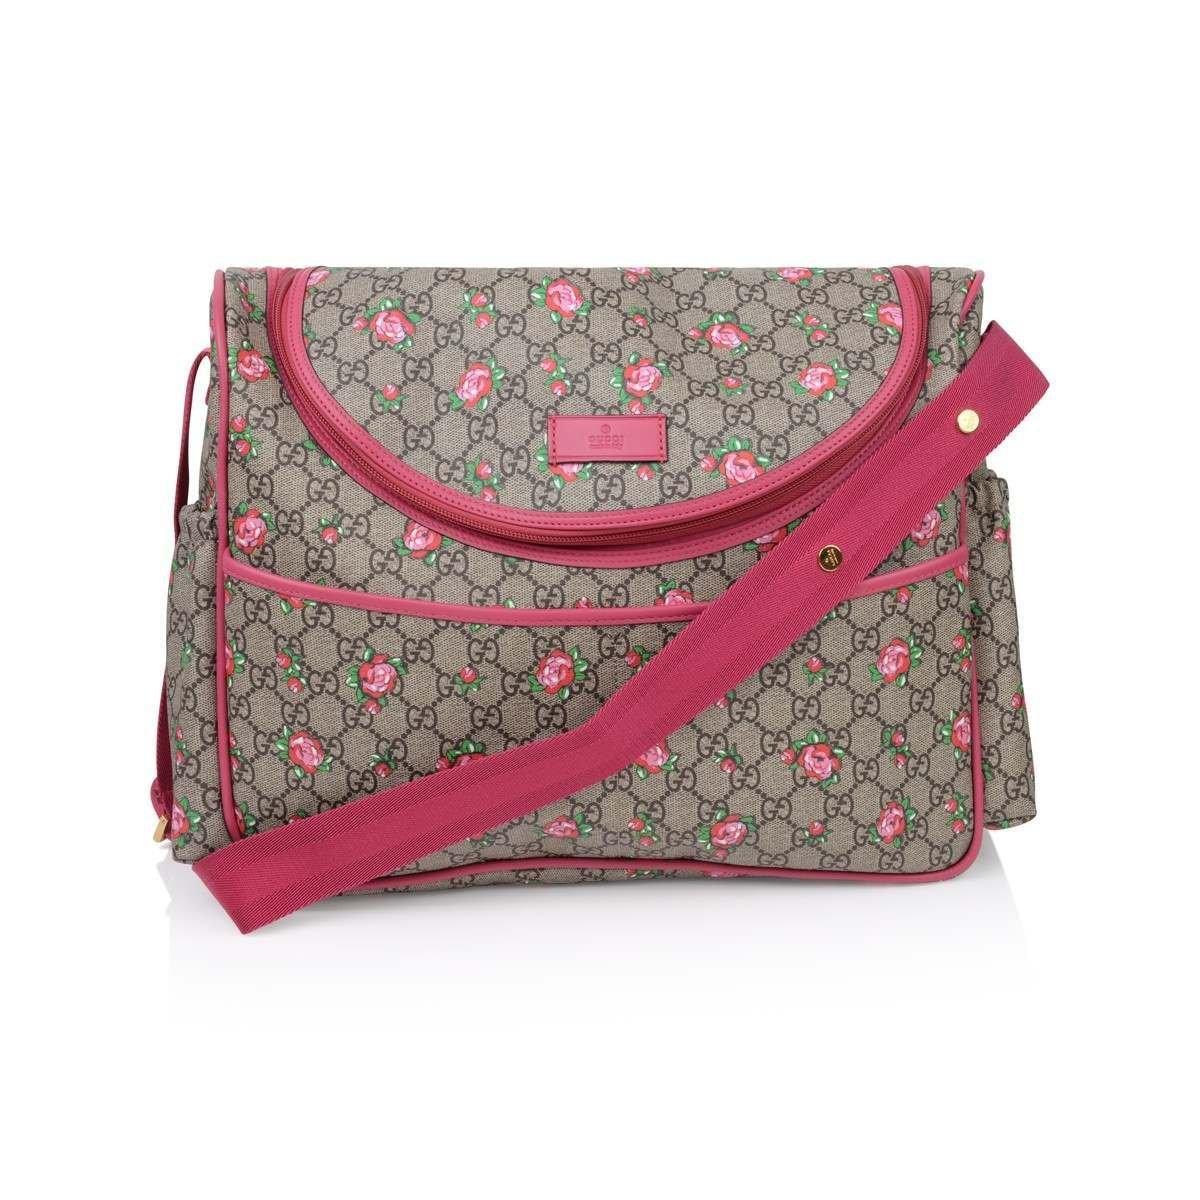 a83de0d1c827 Amazon.com: Gucci Rose Bud Zip Pink Print GG Canvas Diaper Bag Beige Girl  Baby Italy New: Shoes